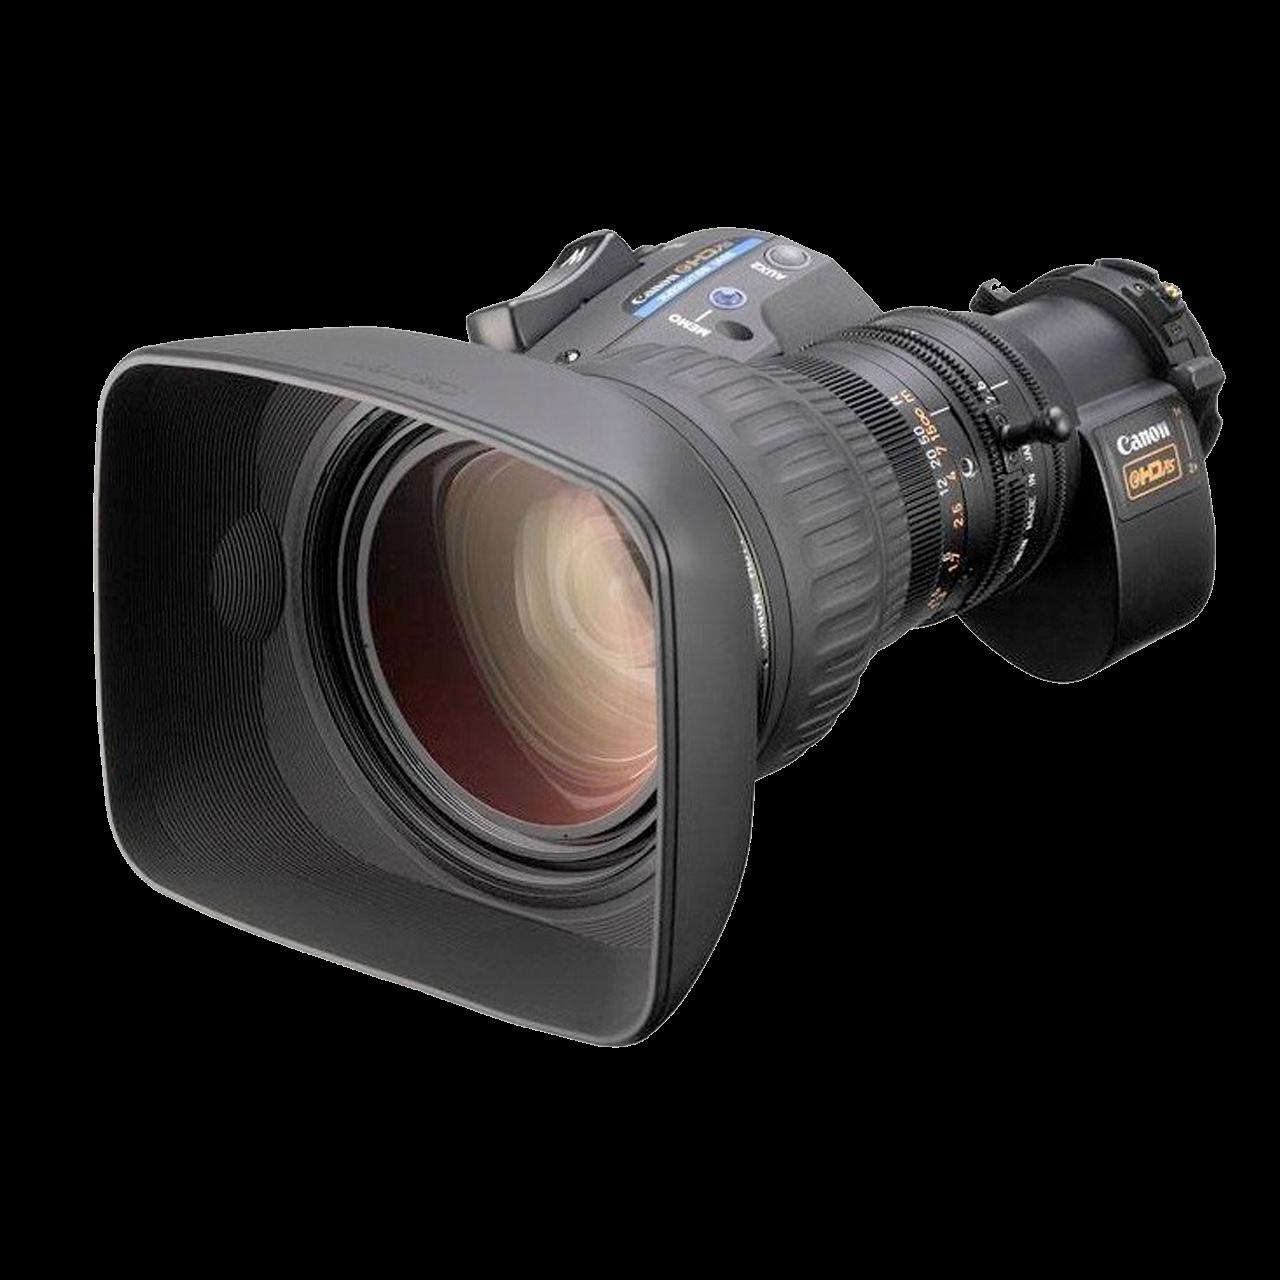 Аренда длиннофокусного телевизионного объектива Б4 B4 для трансляции